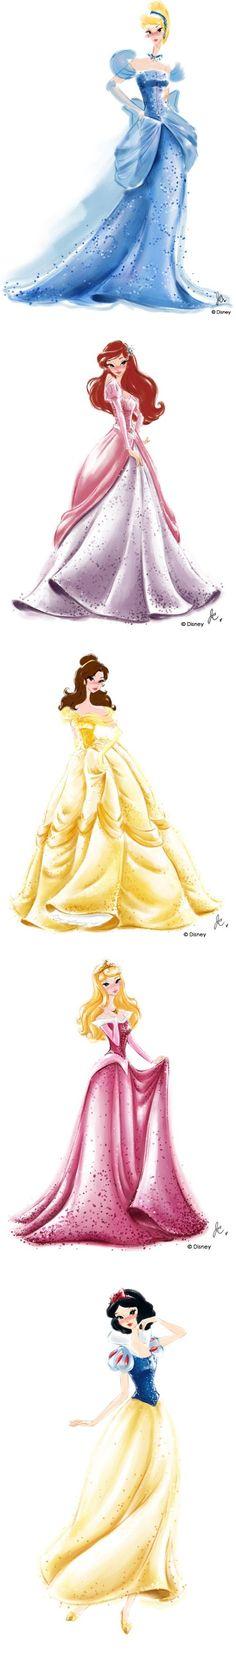 Disney Princess Watercolors by selena